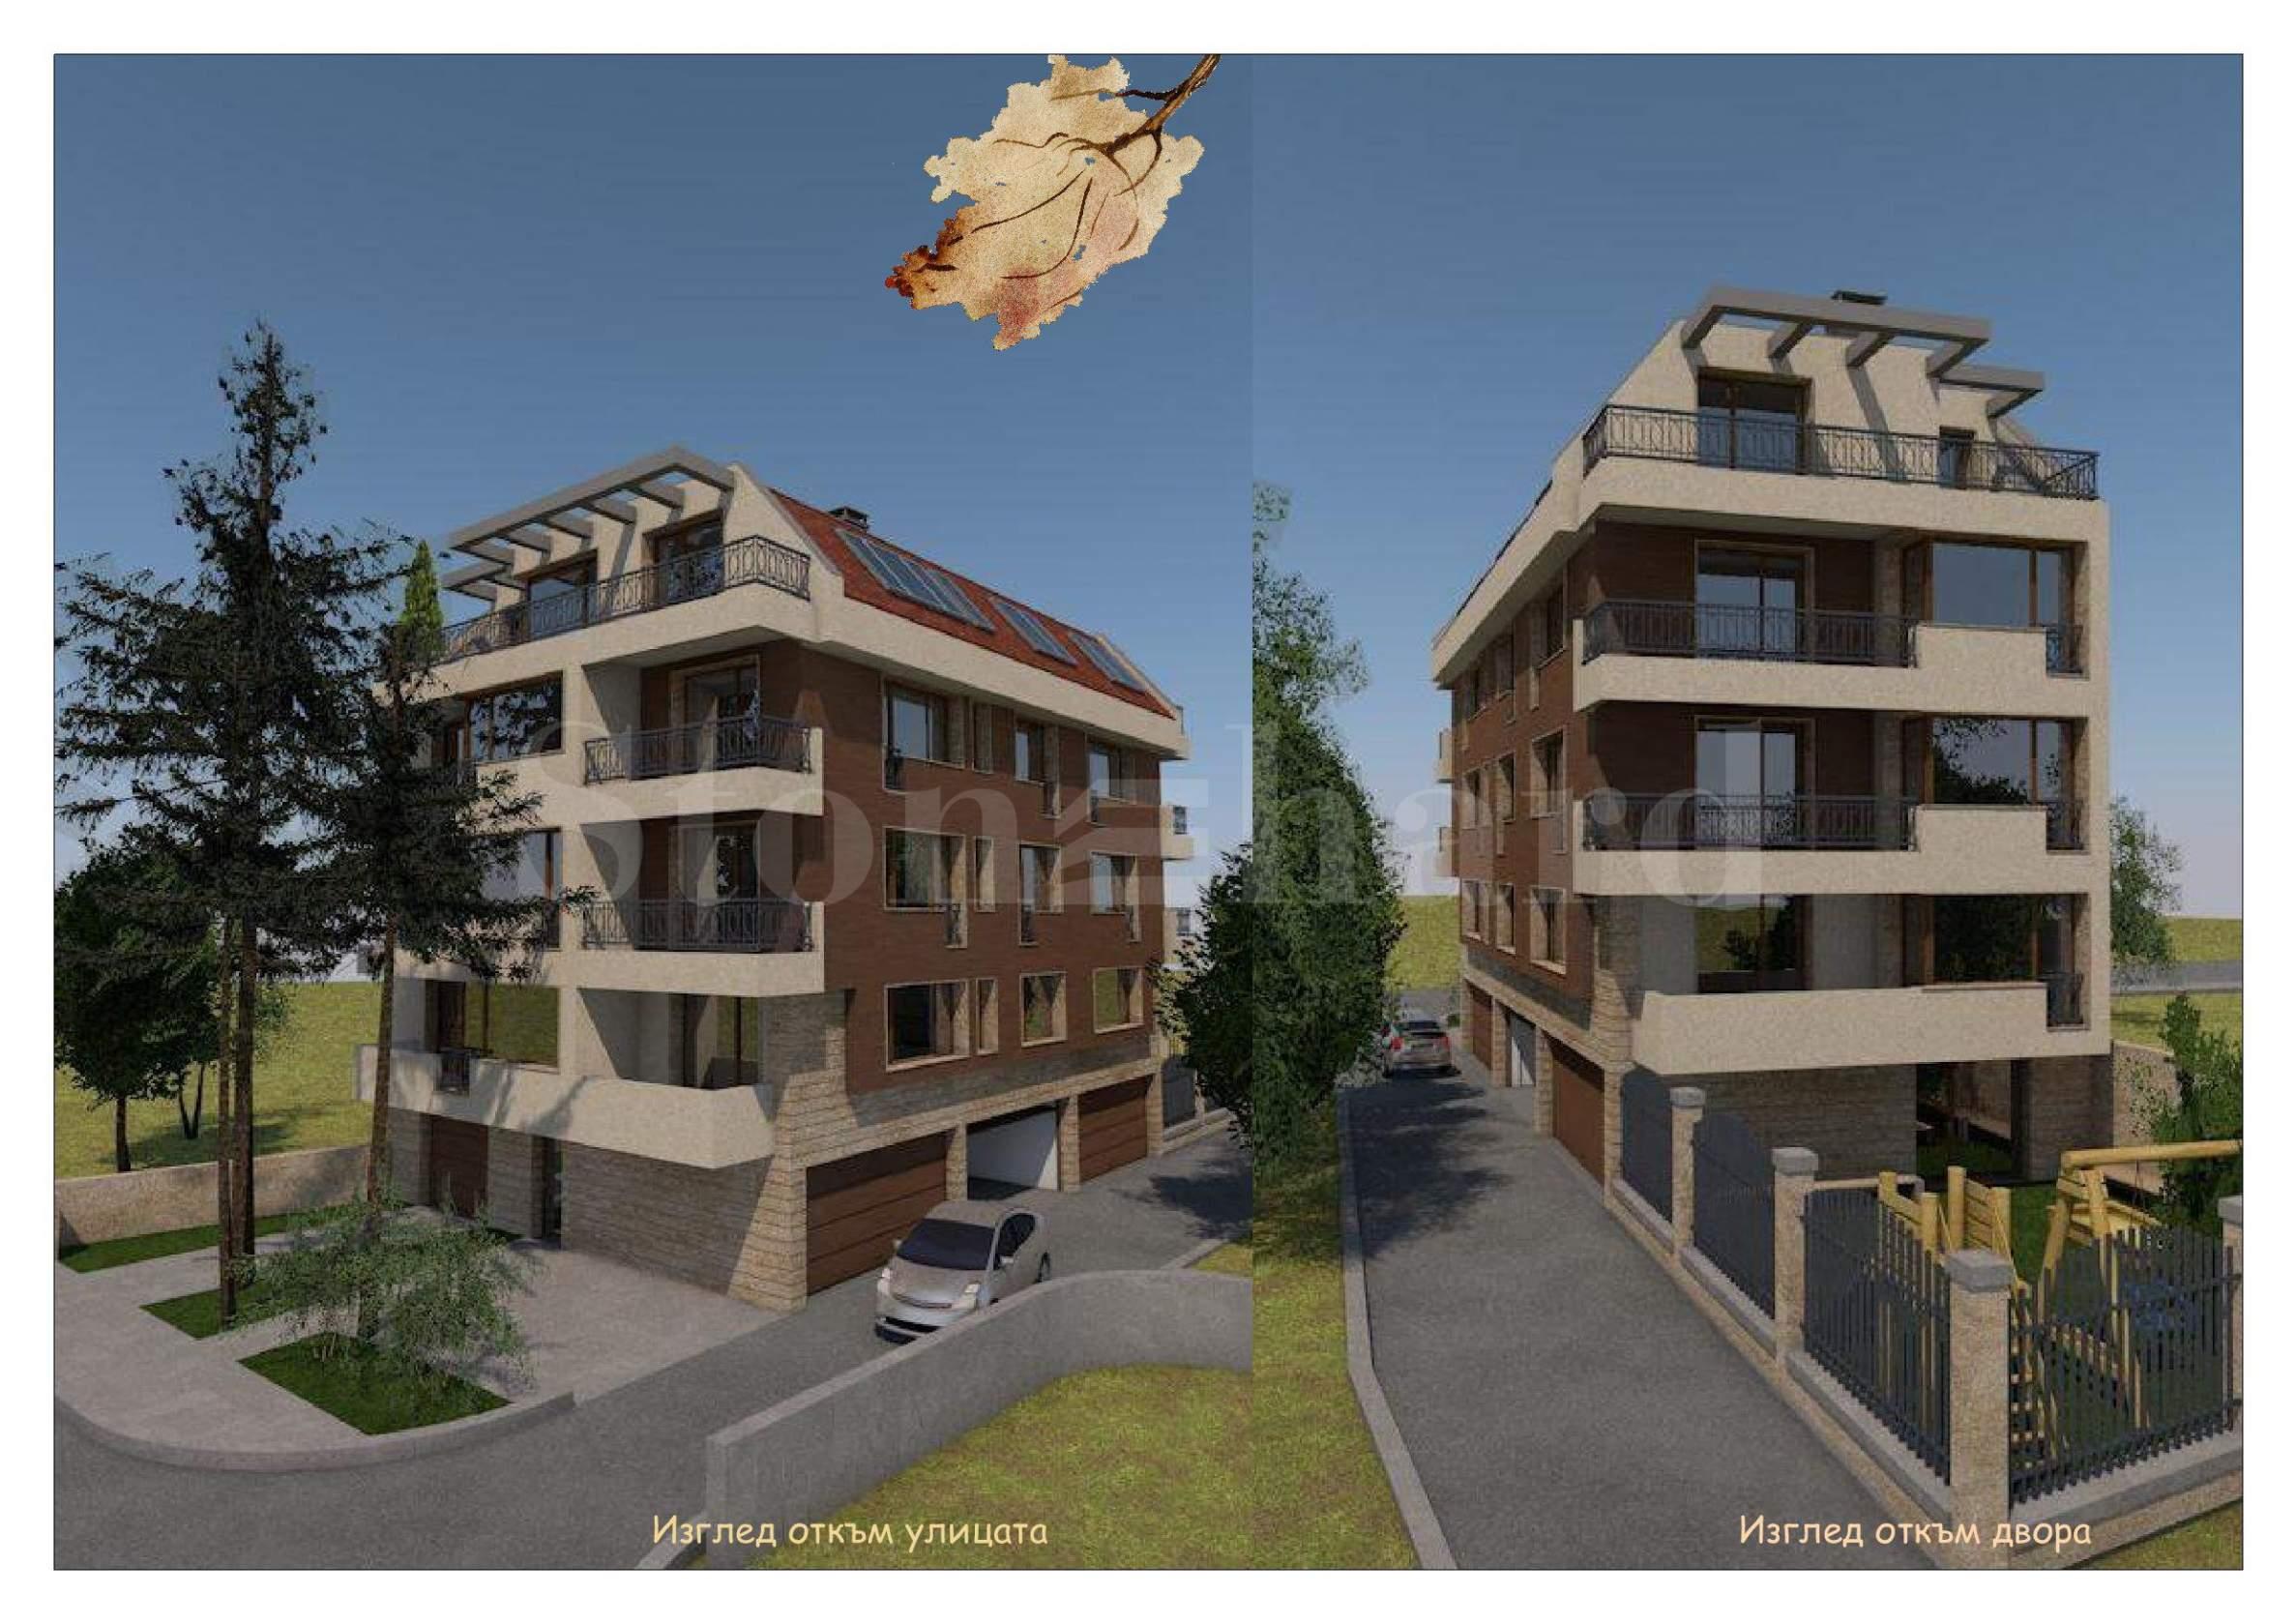 Нова сграда с чудесно местоположение до бул. Цар Борис III1 - Stonehard